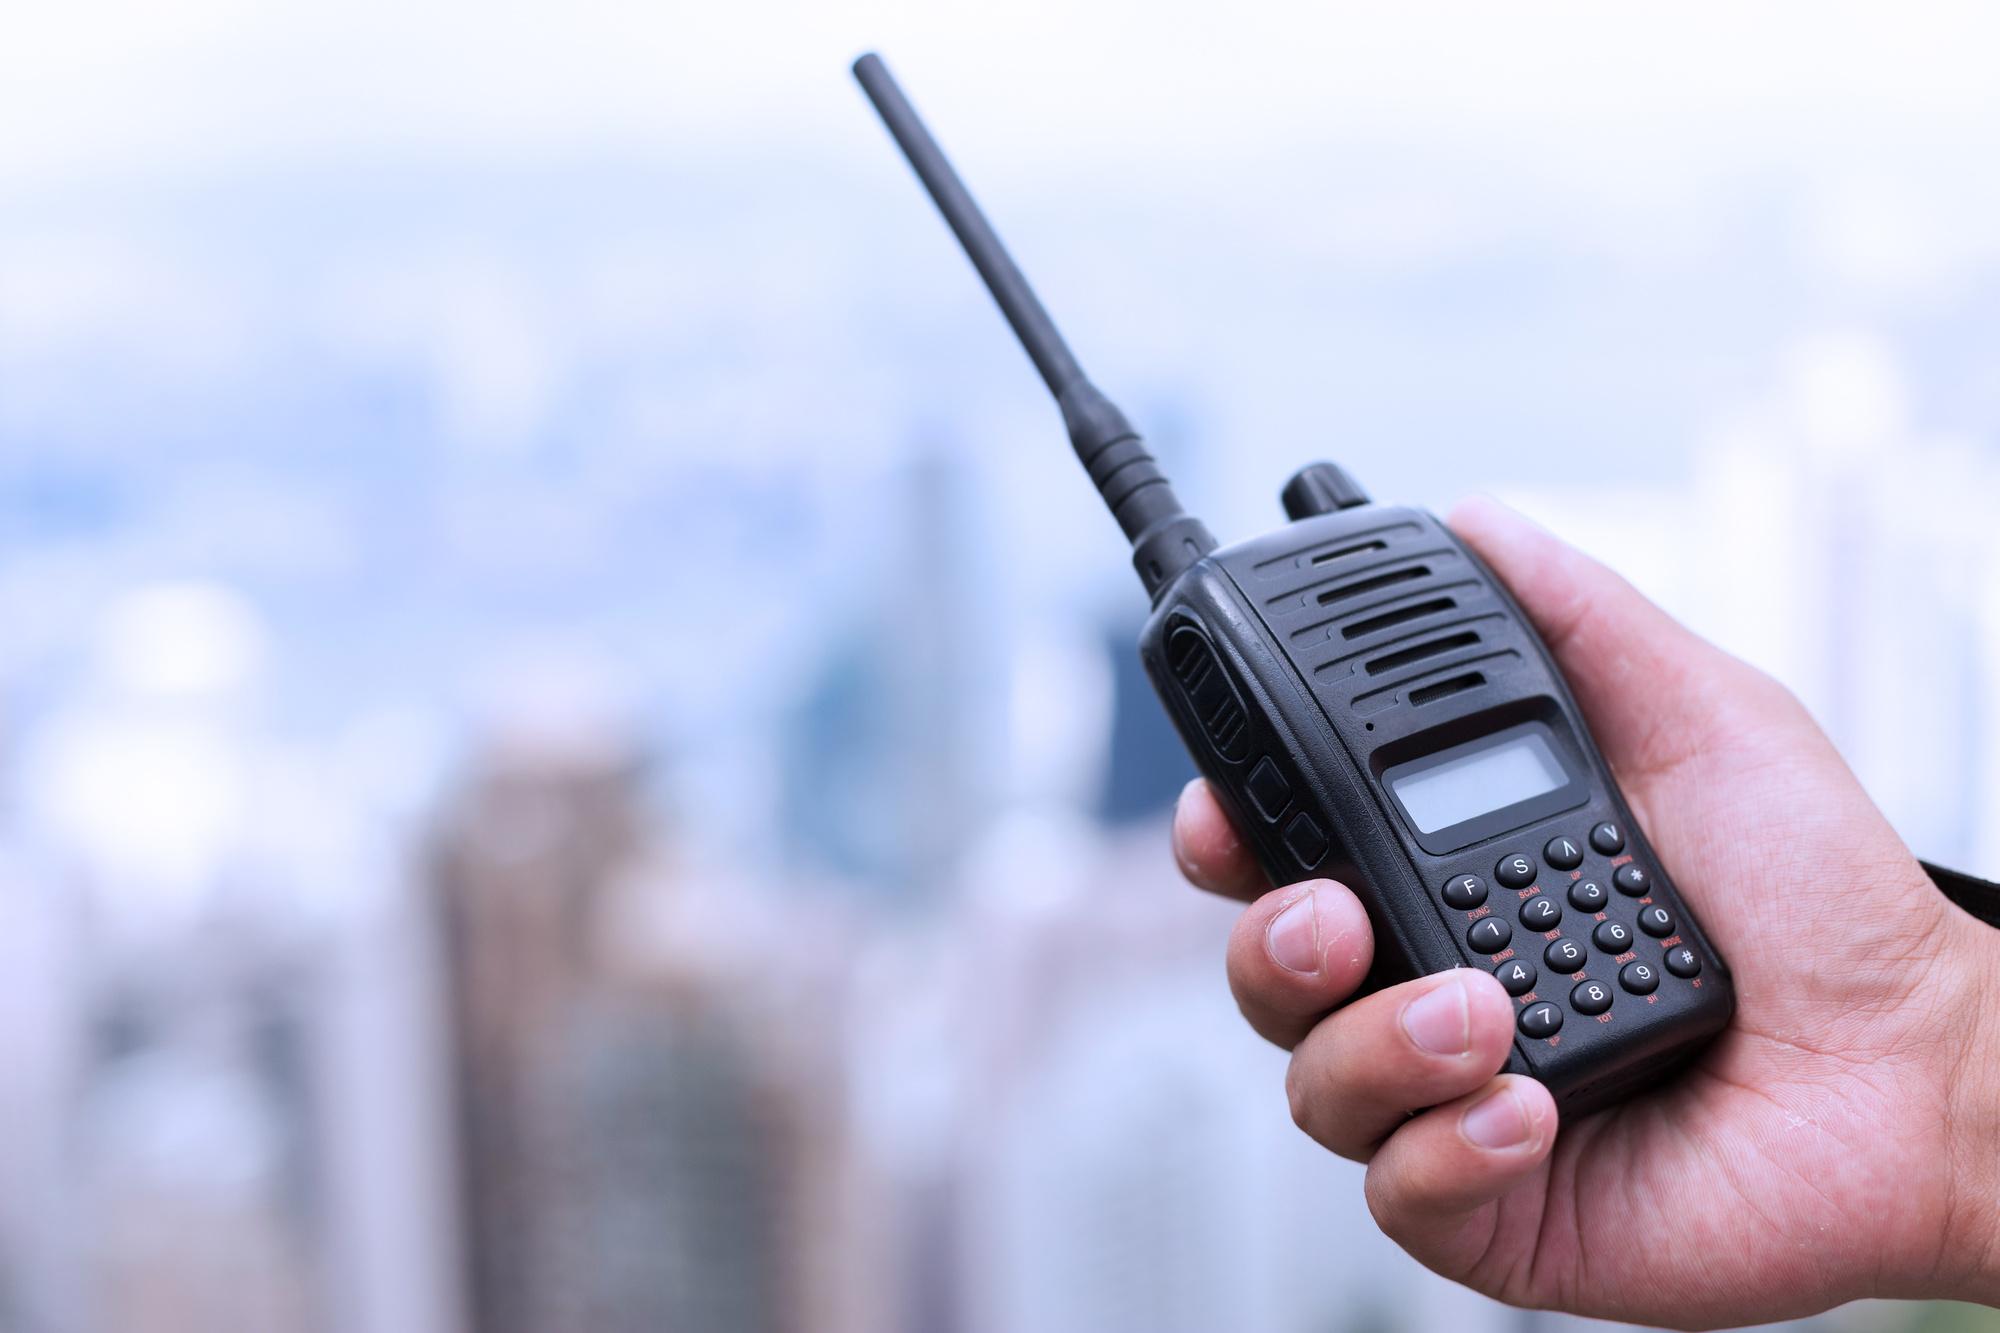 bk radios